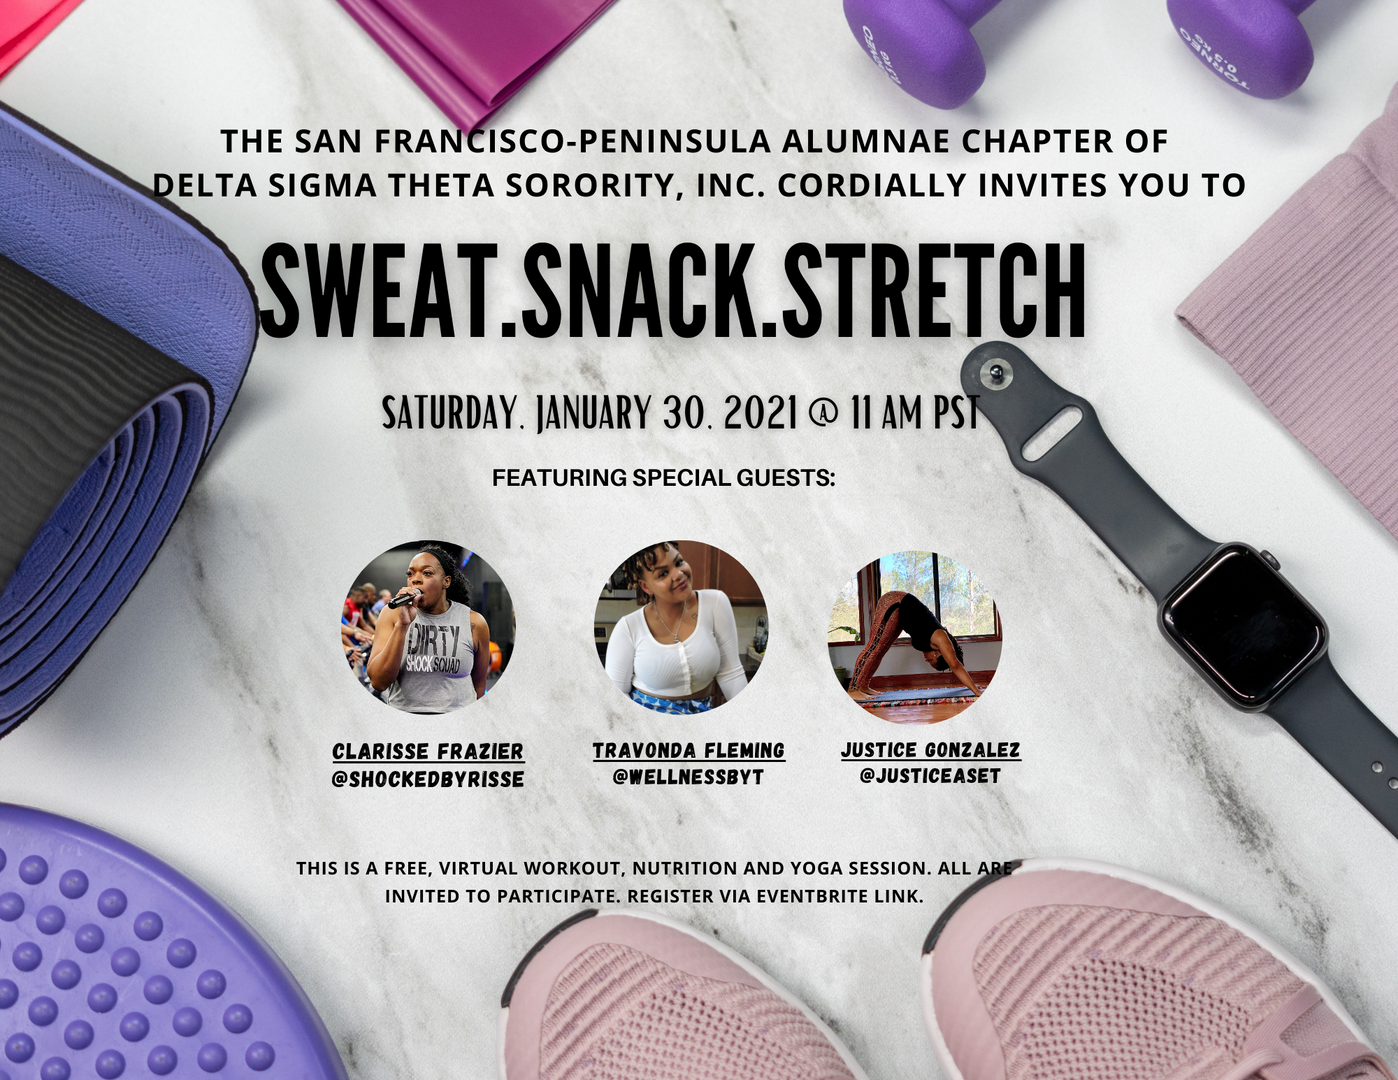 Sweat.Snack.Stretch